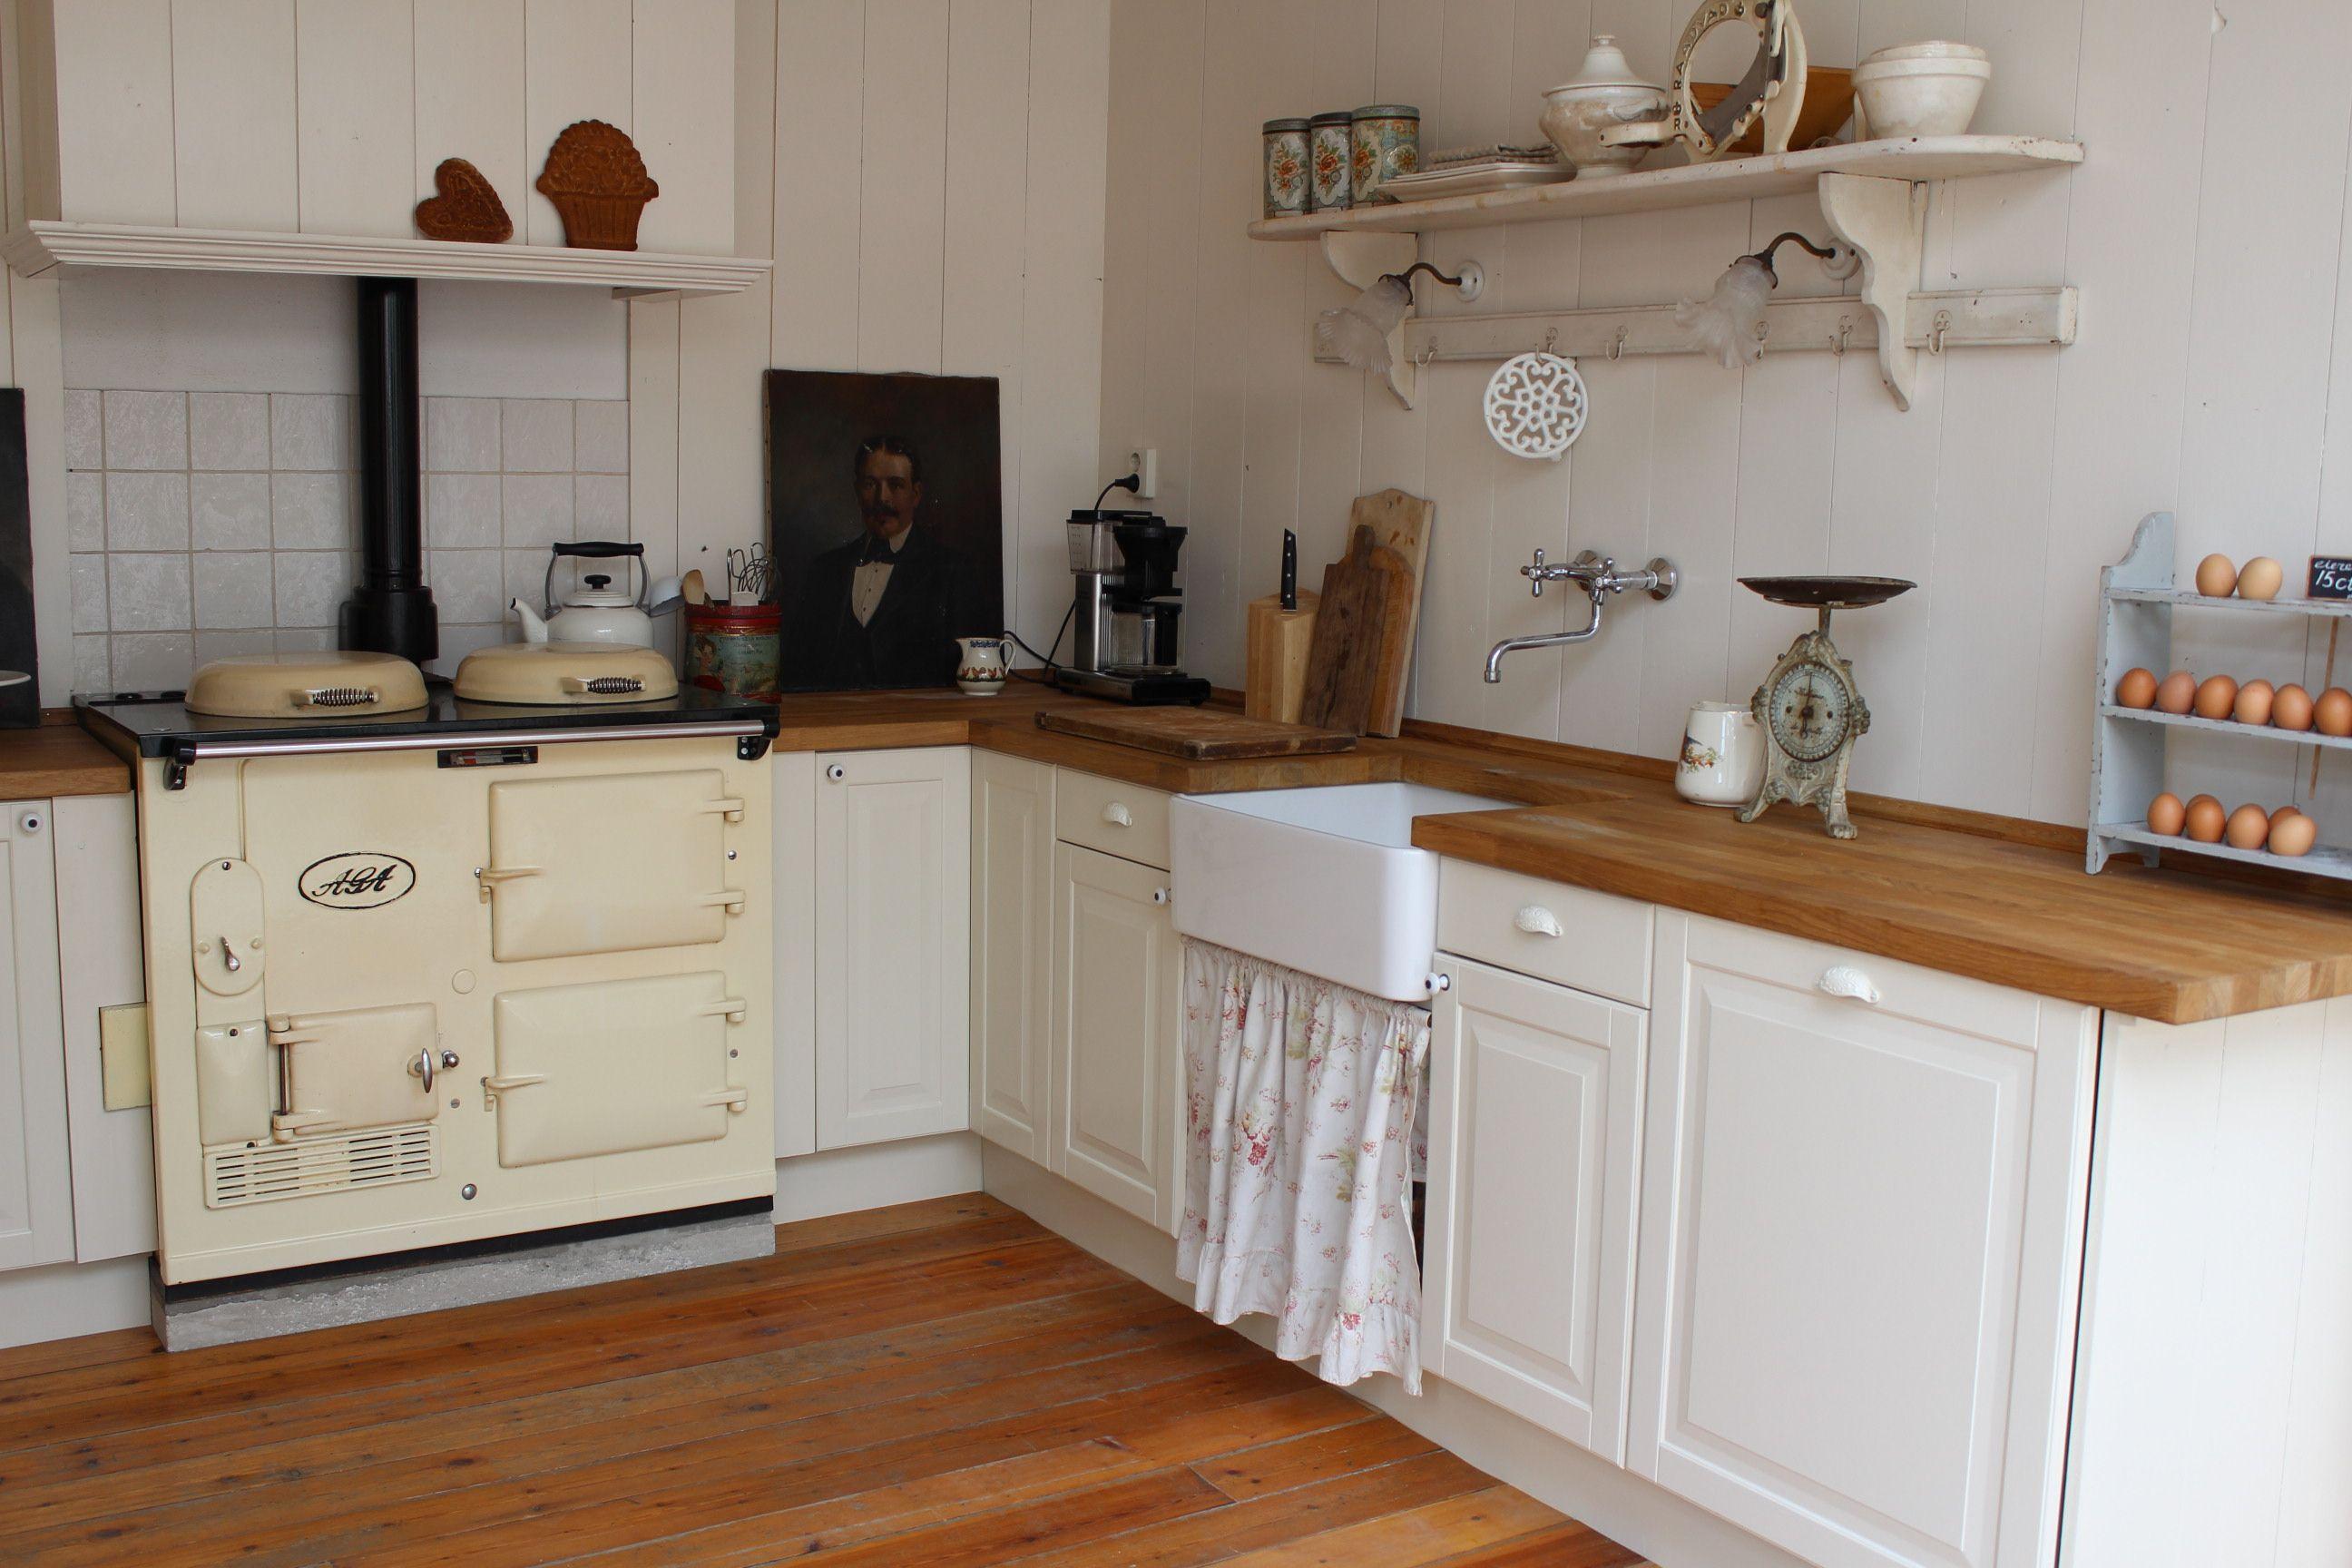 I M So In Love Kitchen Kitchen Cabinets Cosy Kitchen